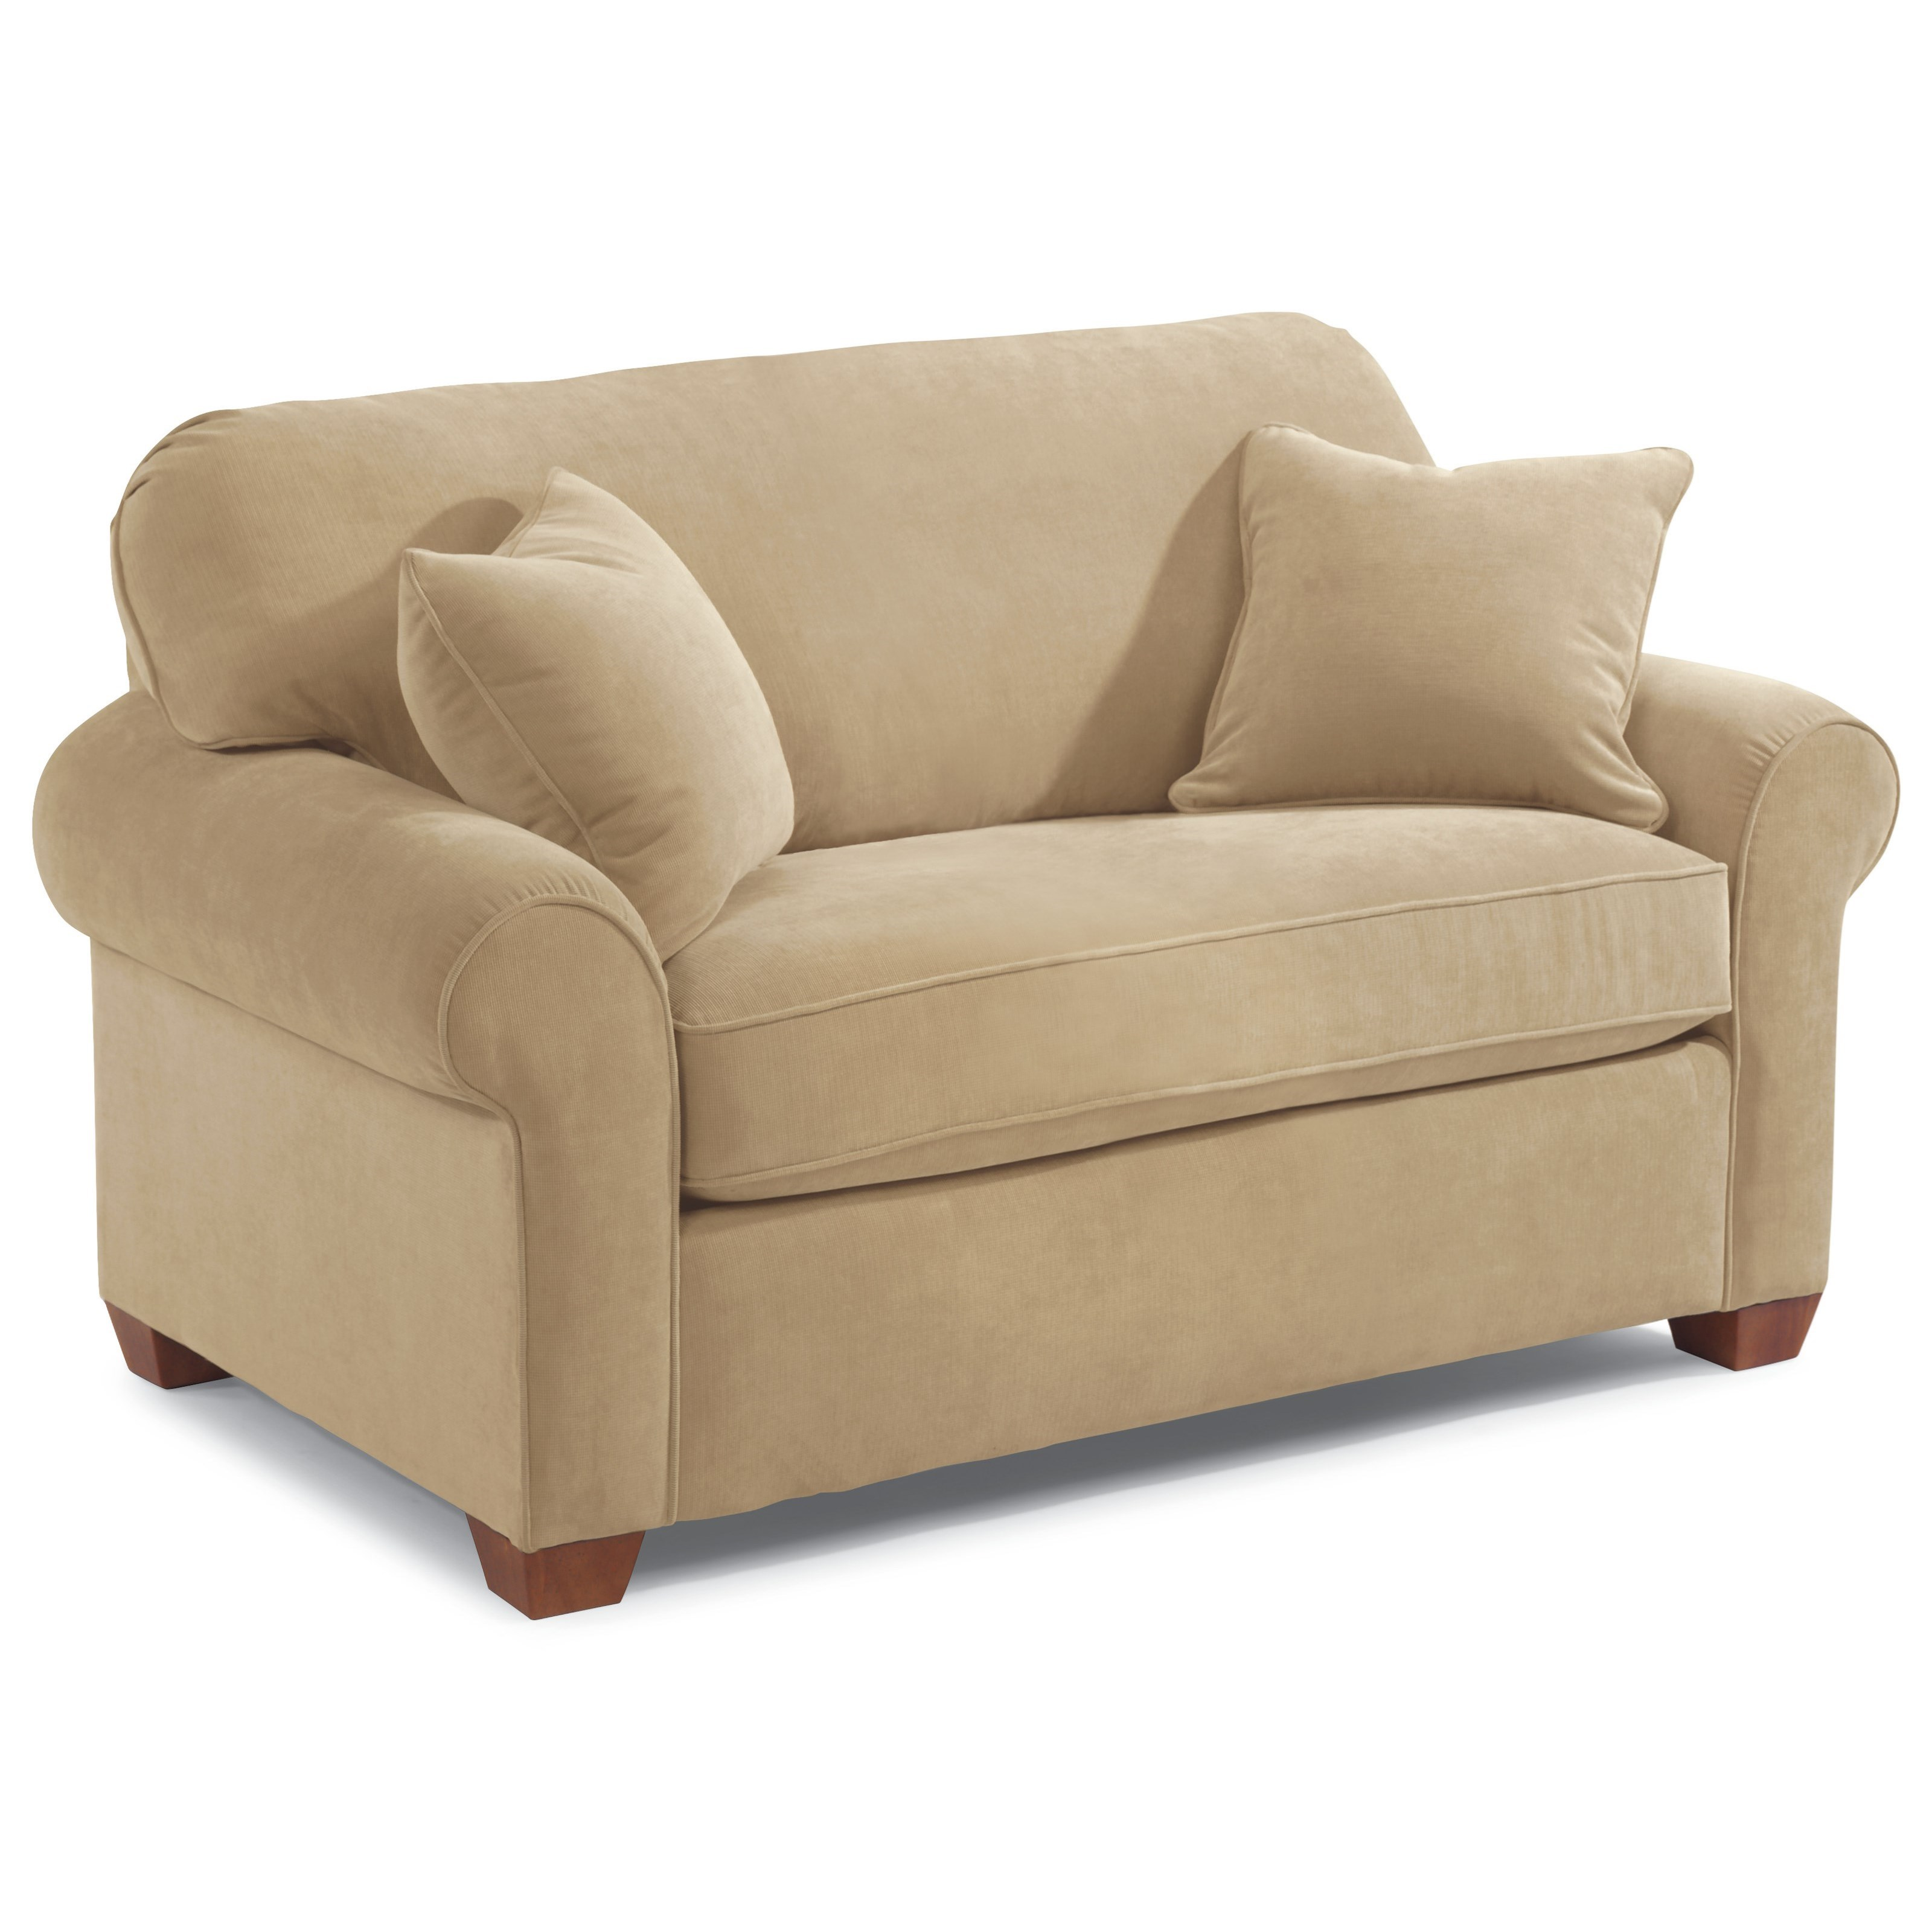 Thornton  Twin Sleeper by Flexsteel at Steger's Furniture